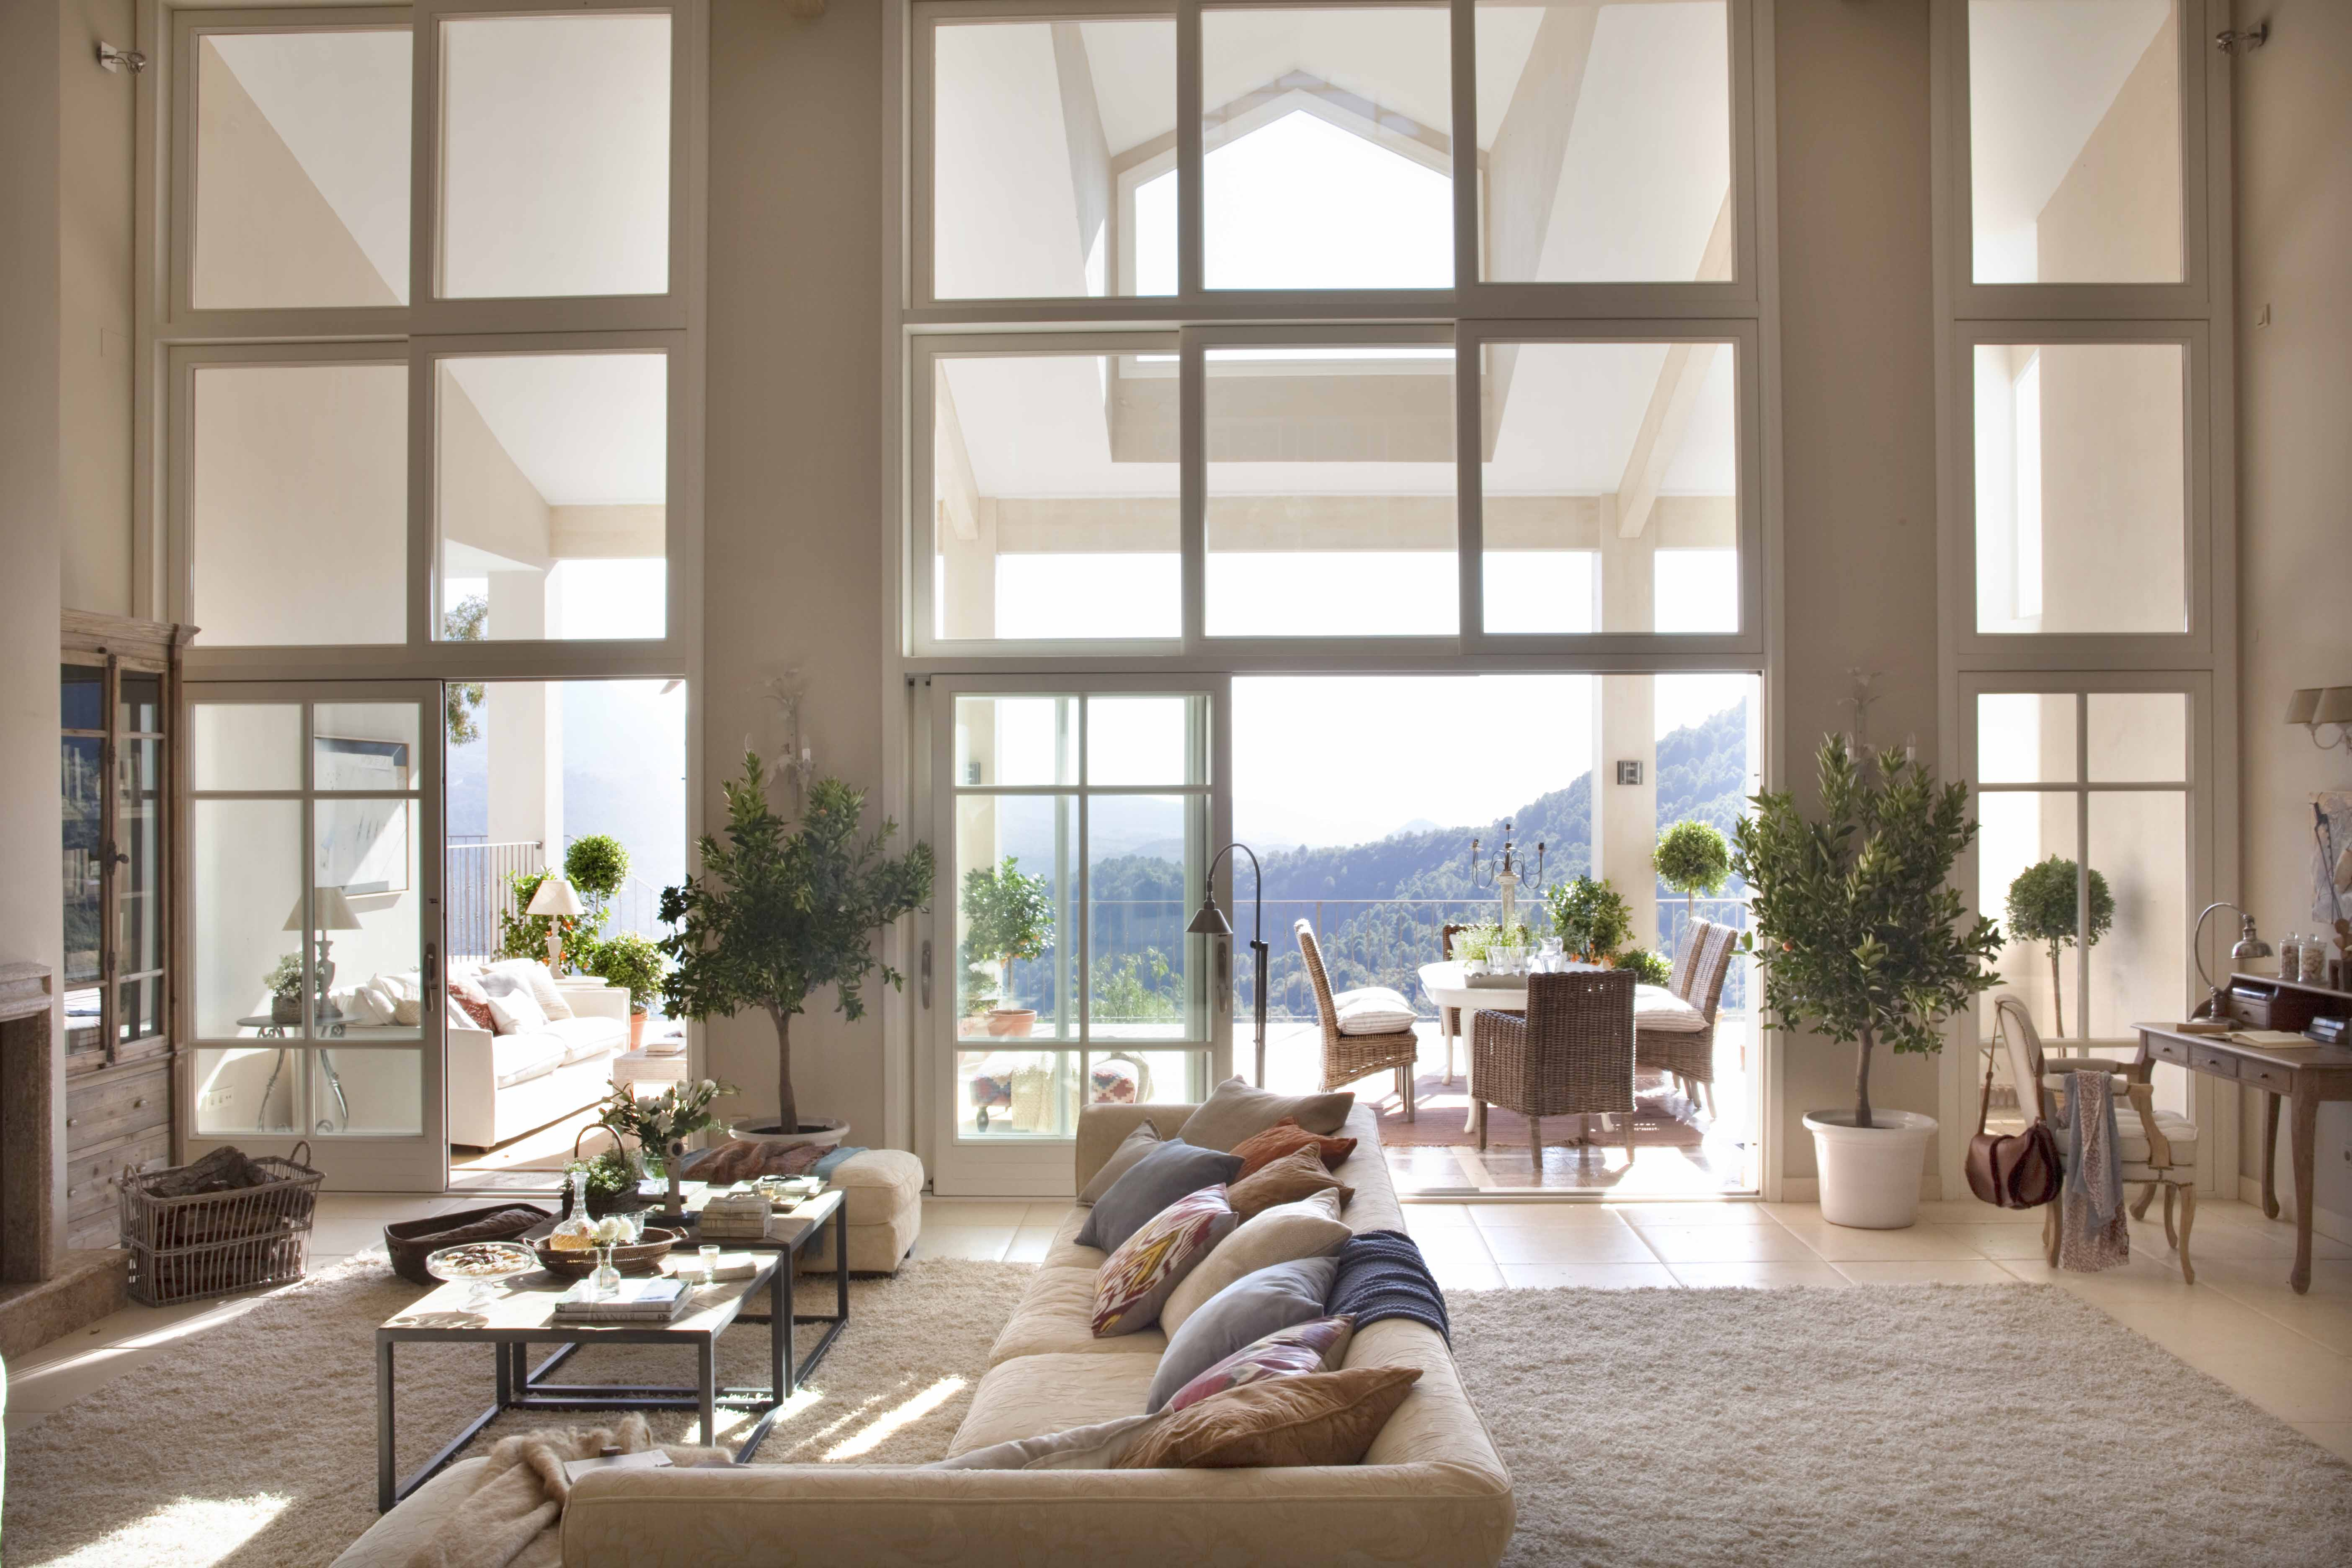 The Living Room Laposadaromana